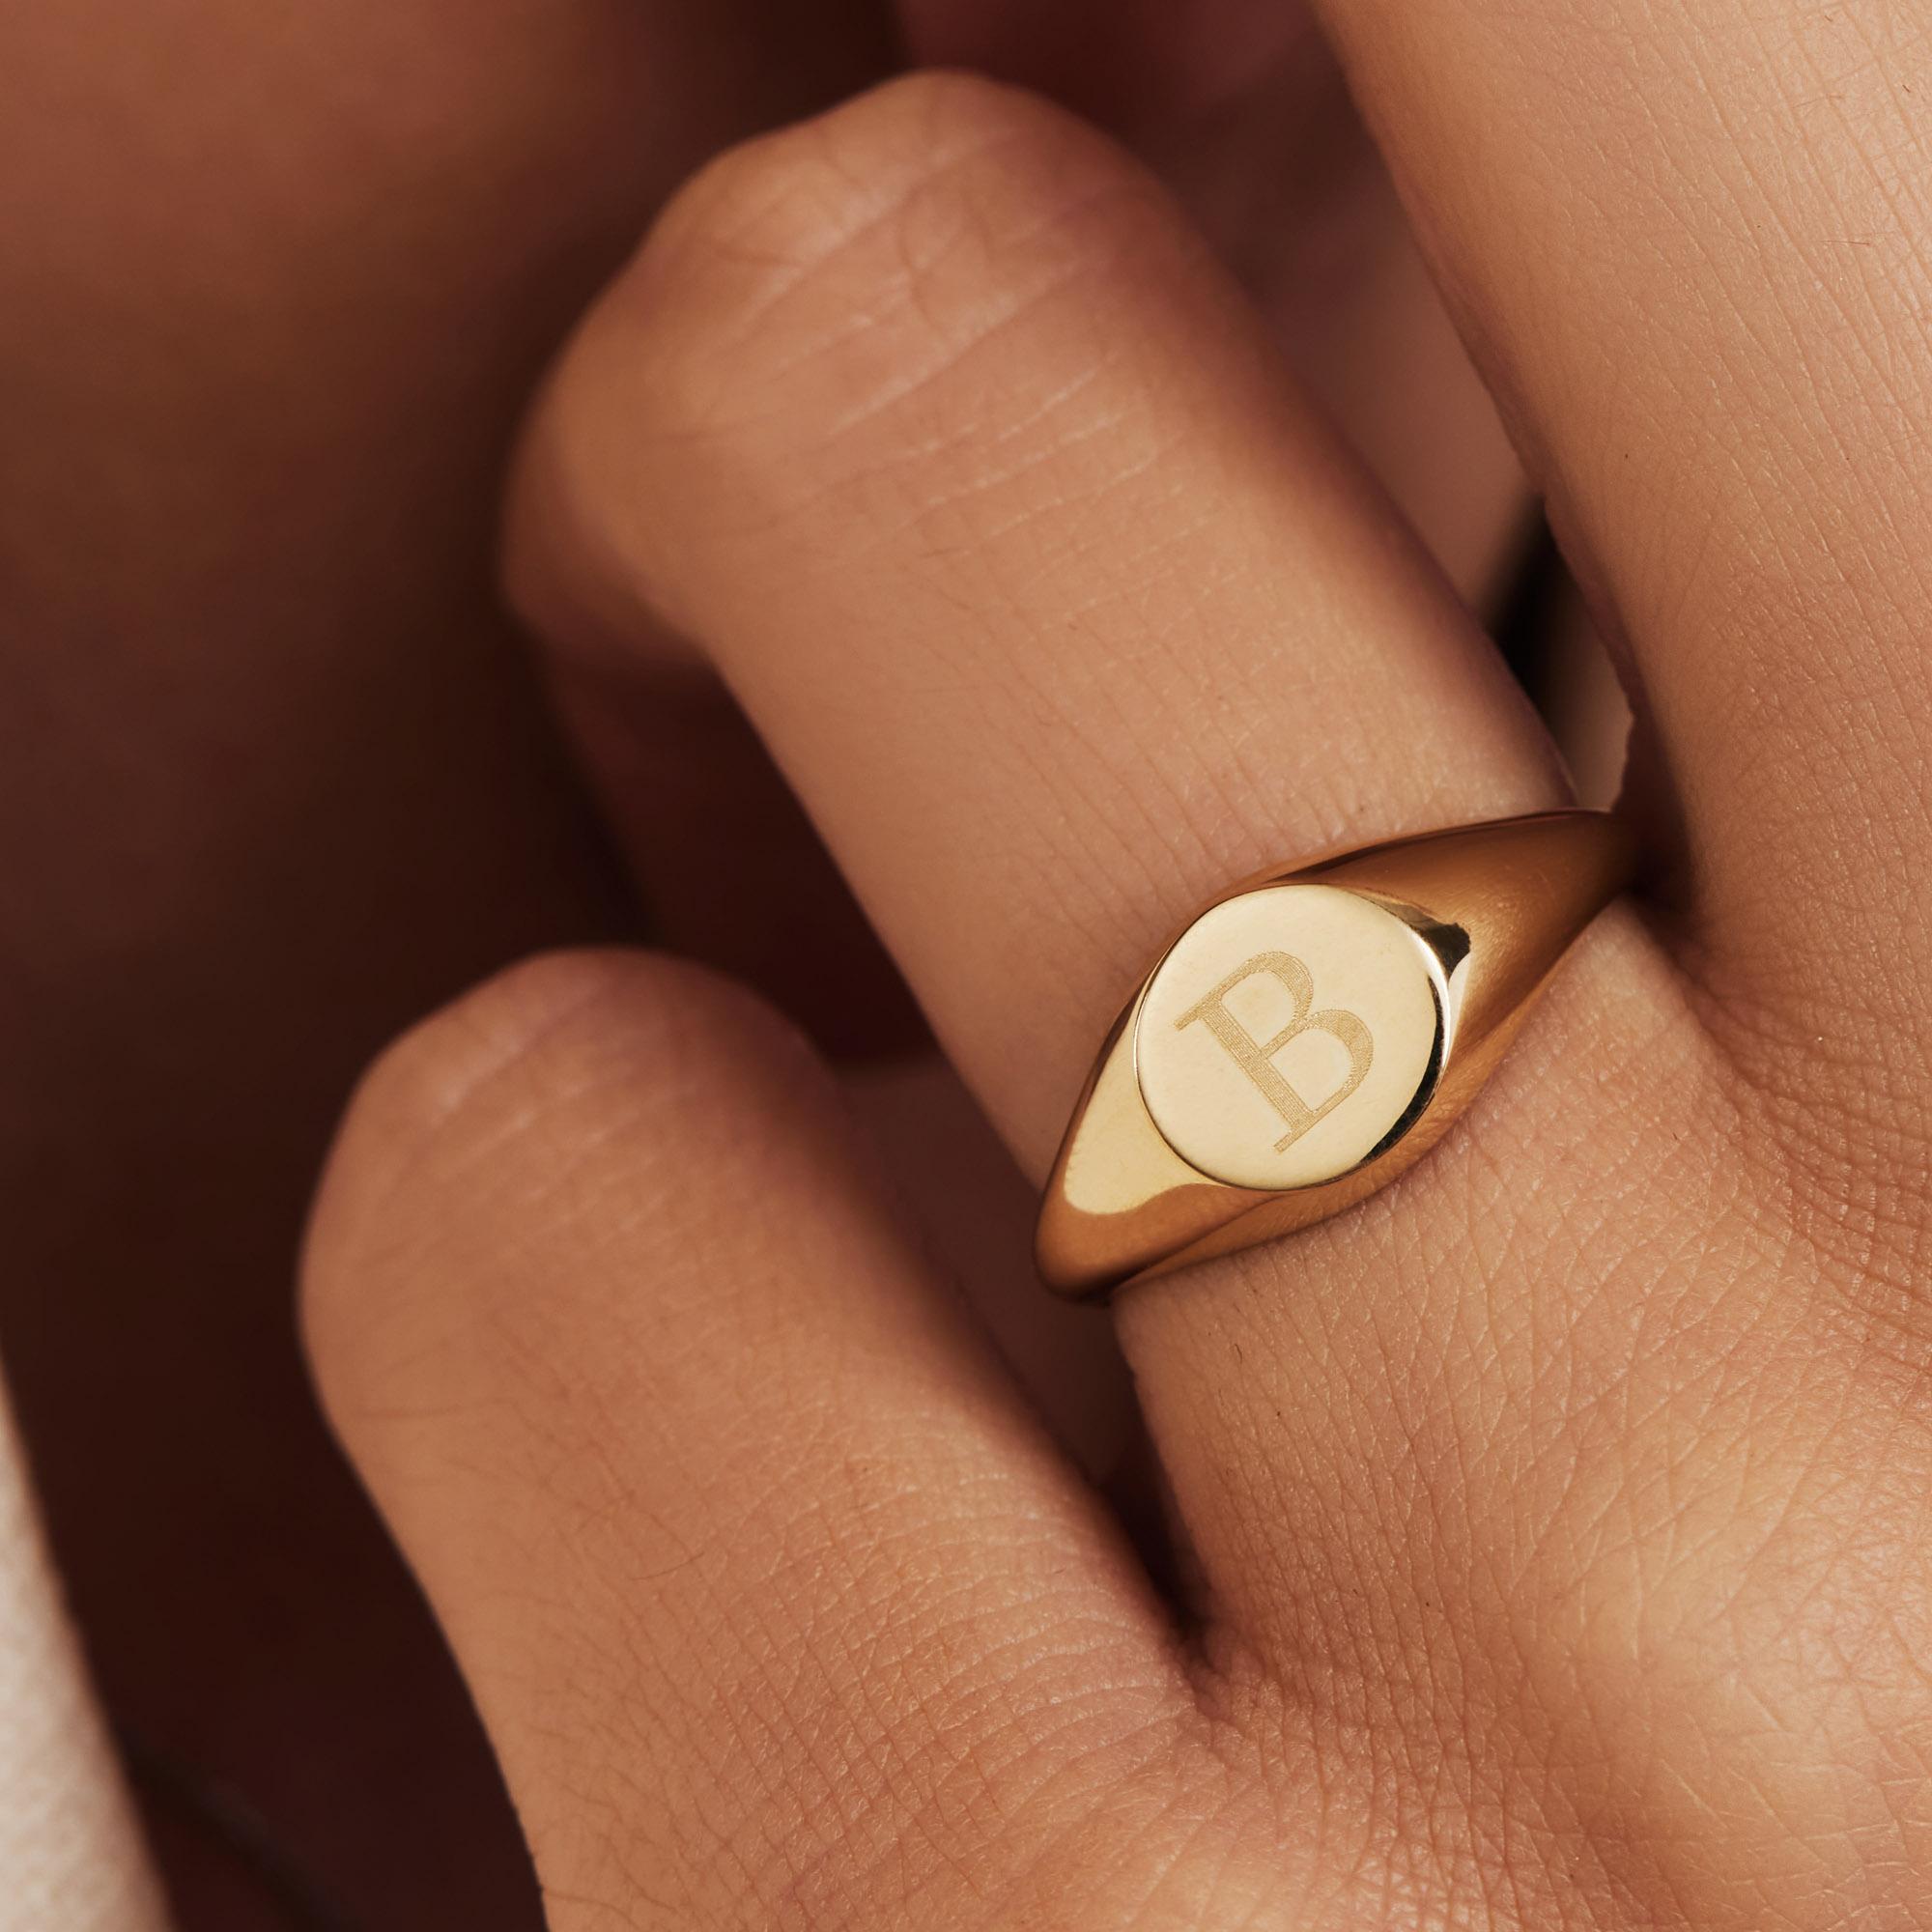 Isabel Bernard Le Marais Lauren 14 karat gold initial signet ring with letter (52)